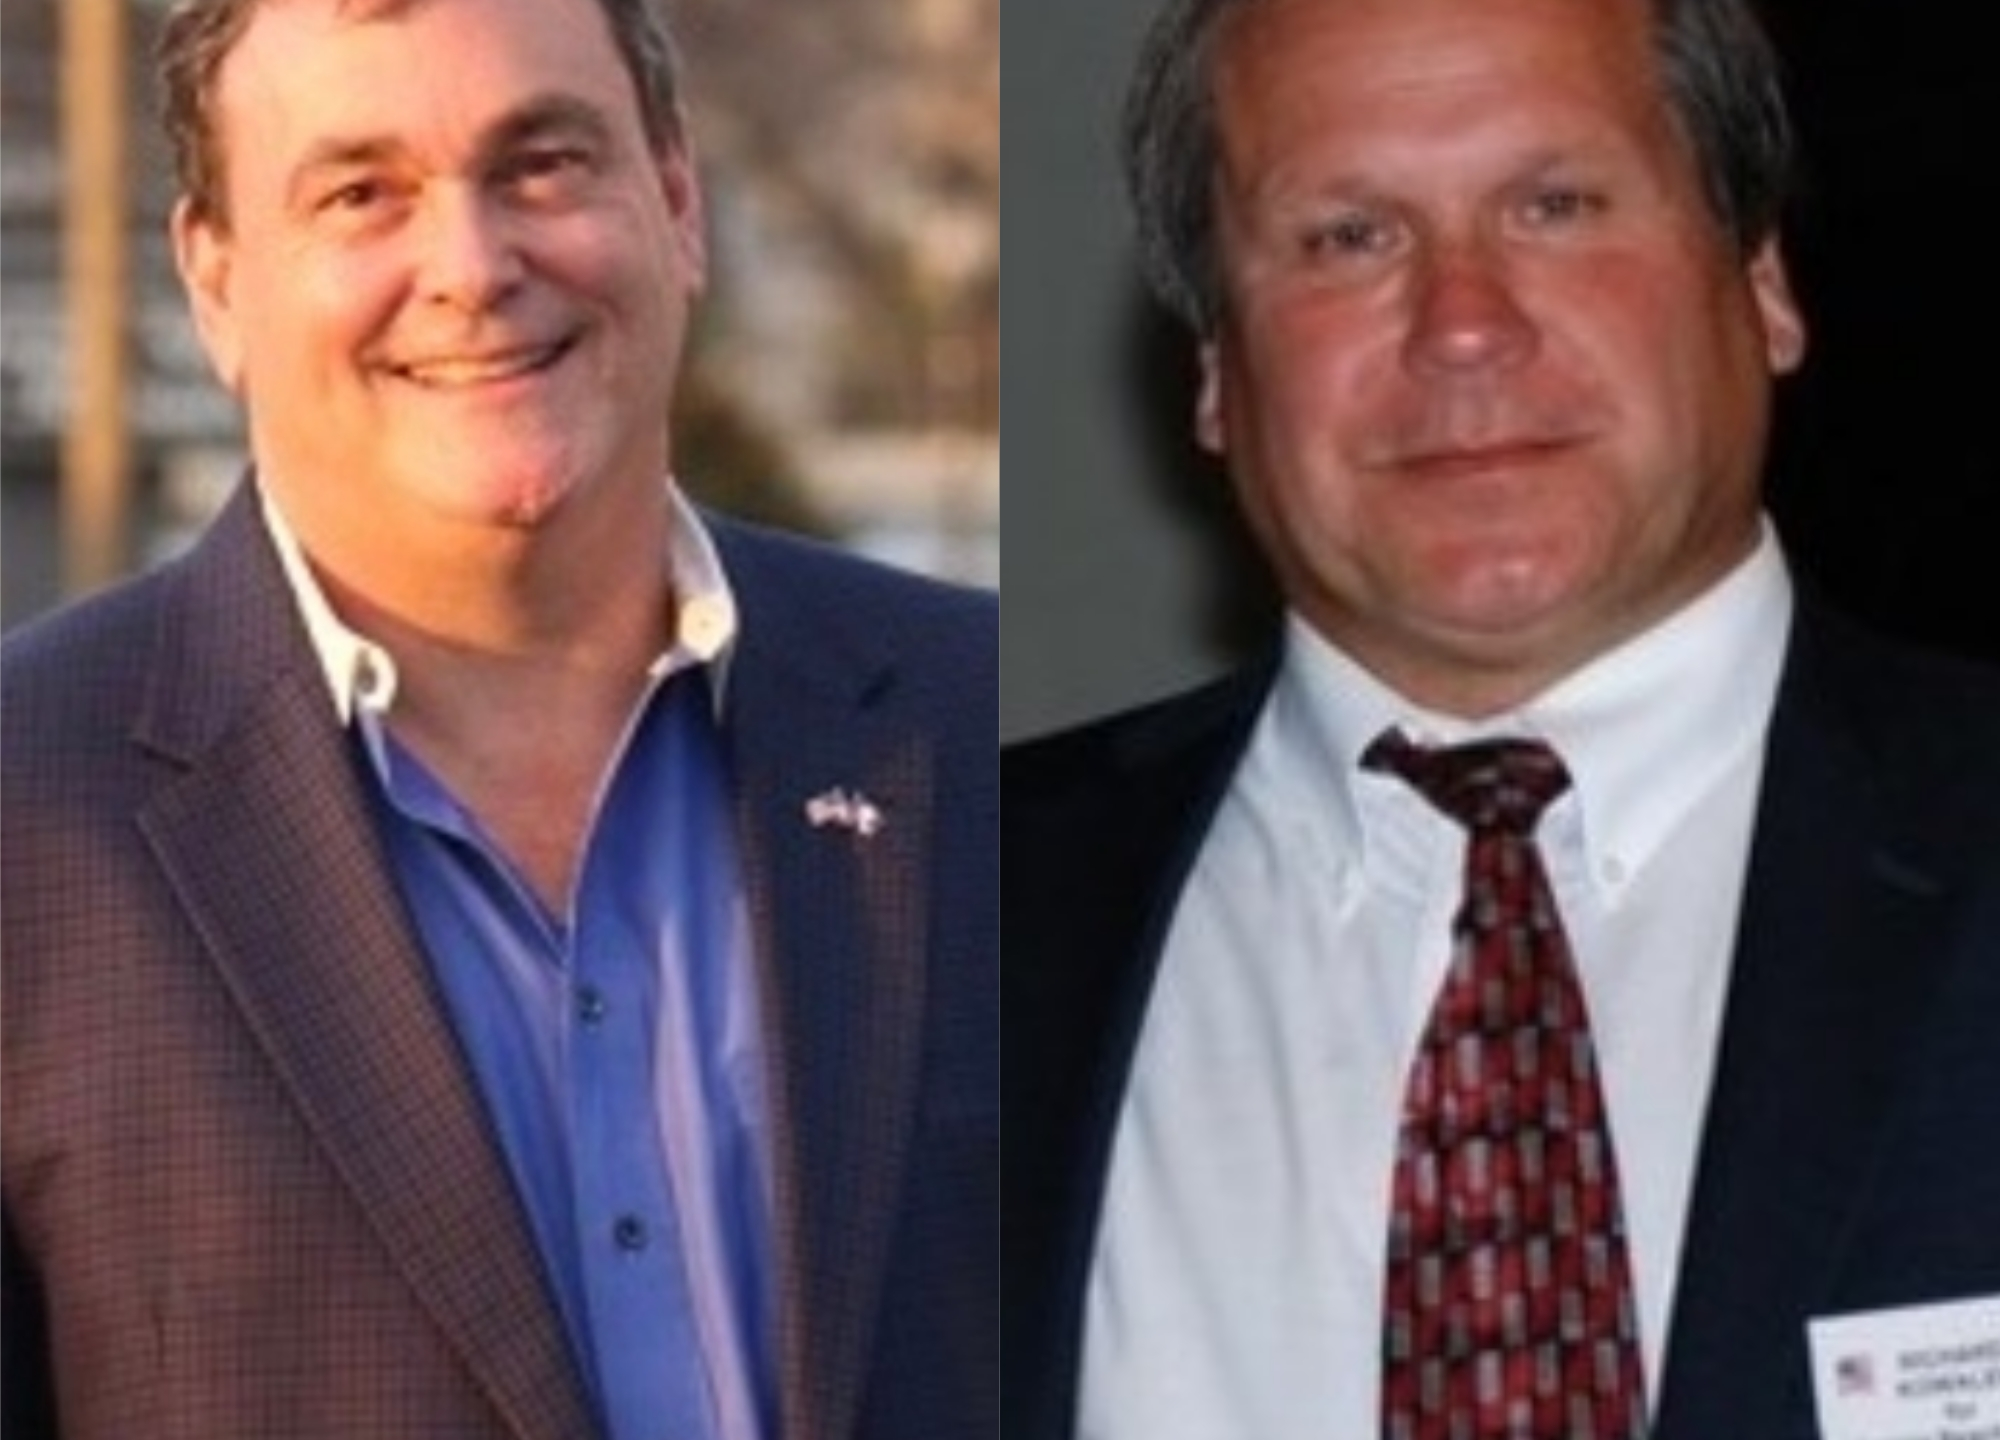 David Nygaard (left) and Richard RK Kowalewitch